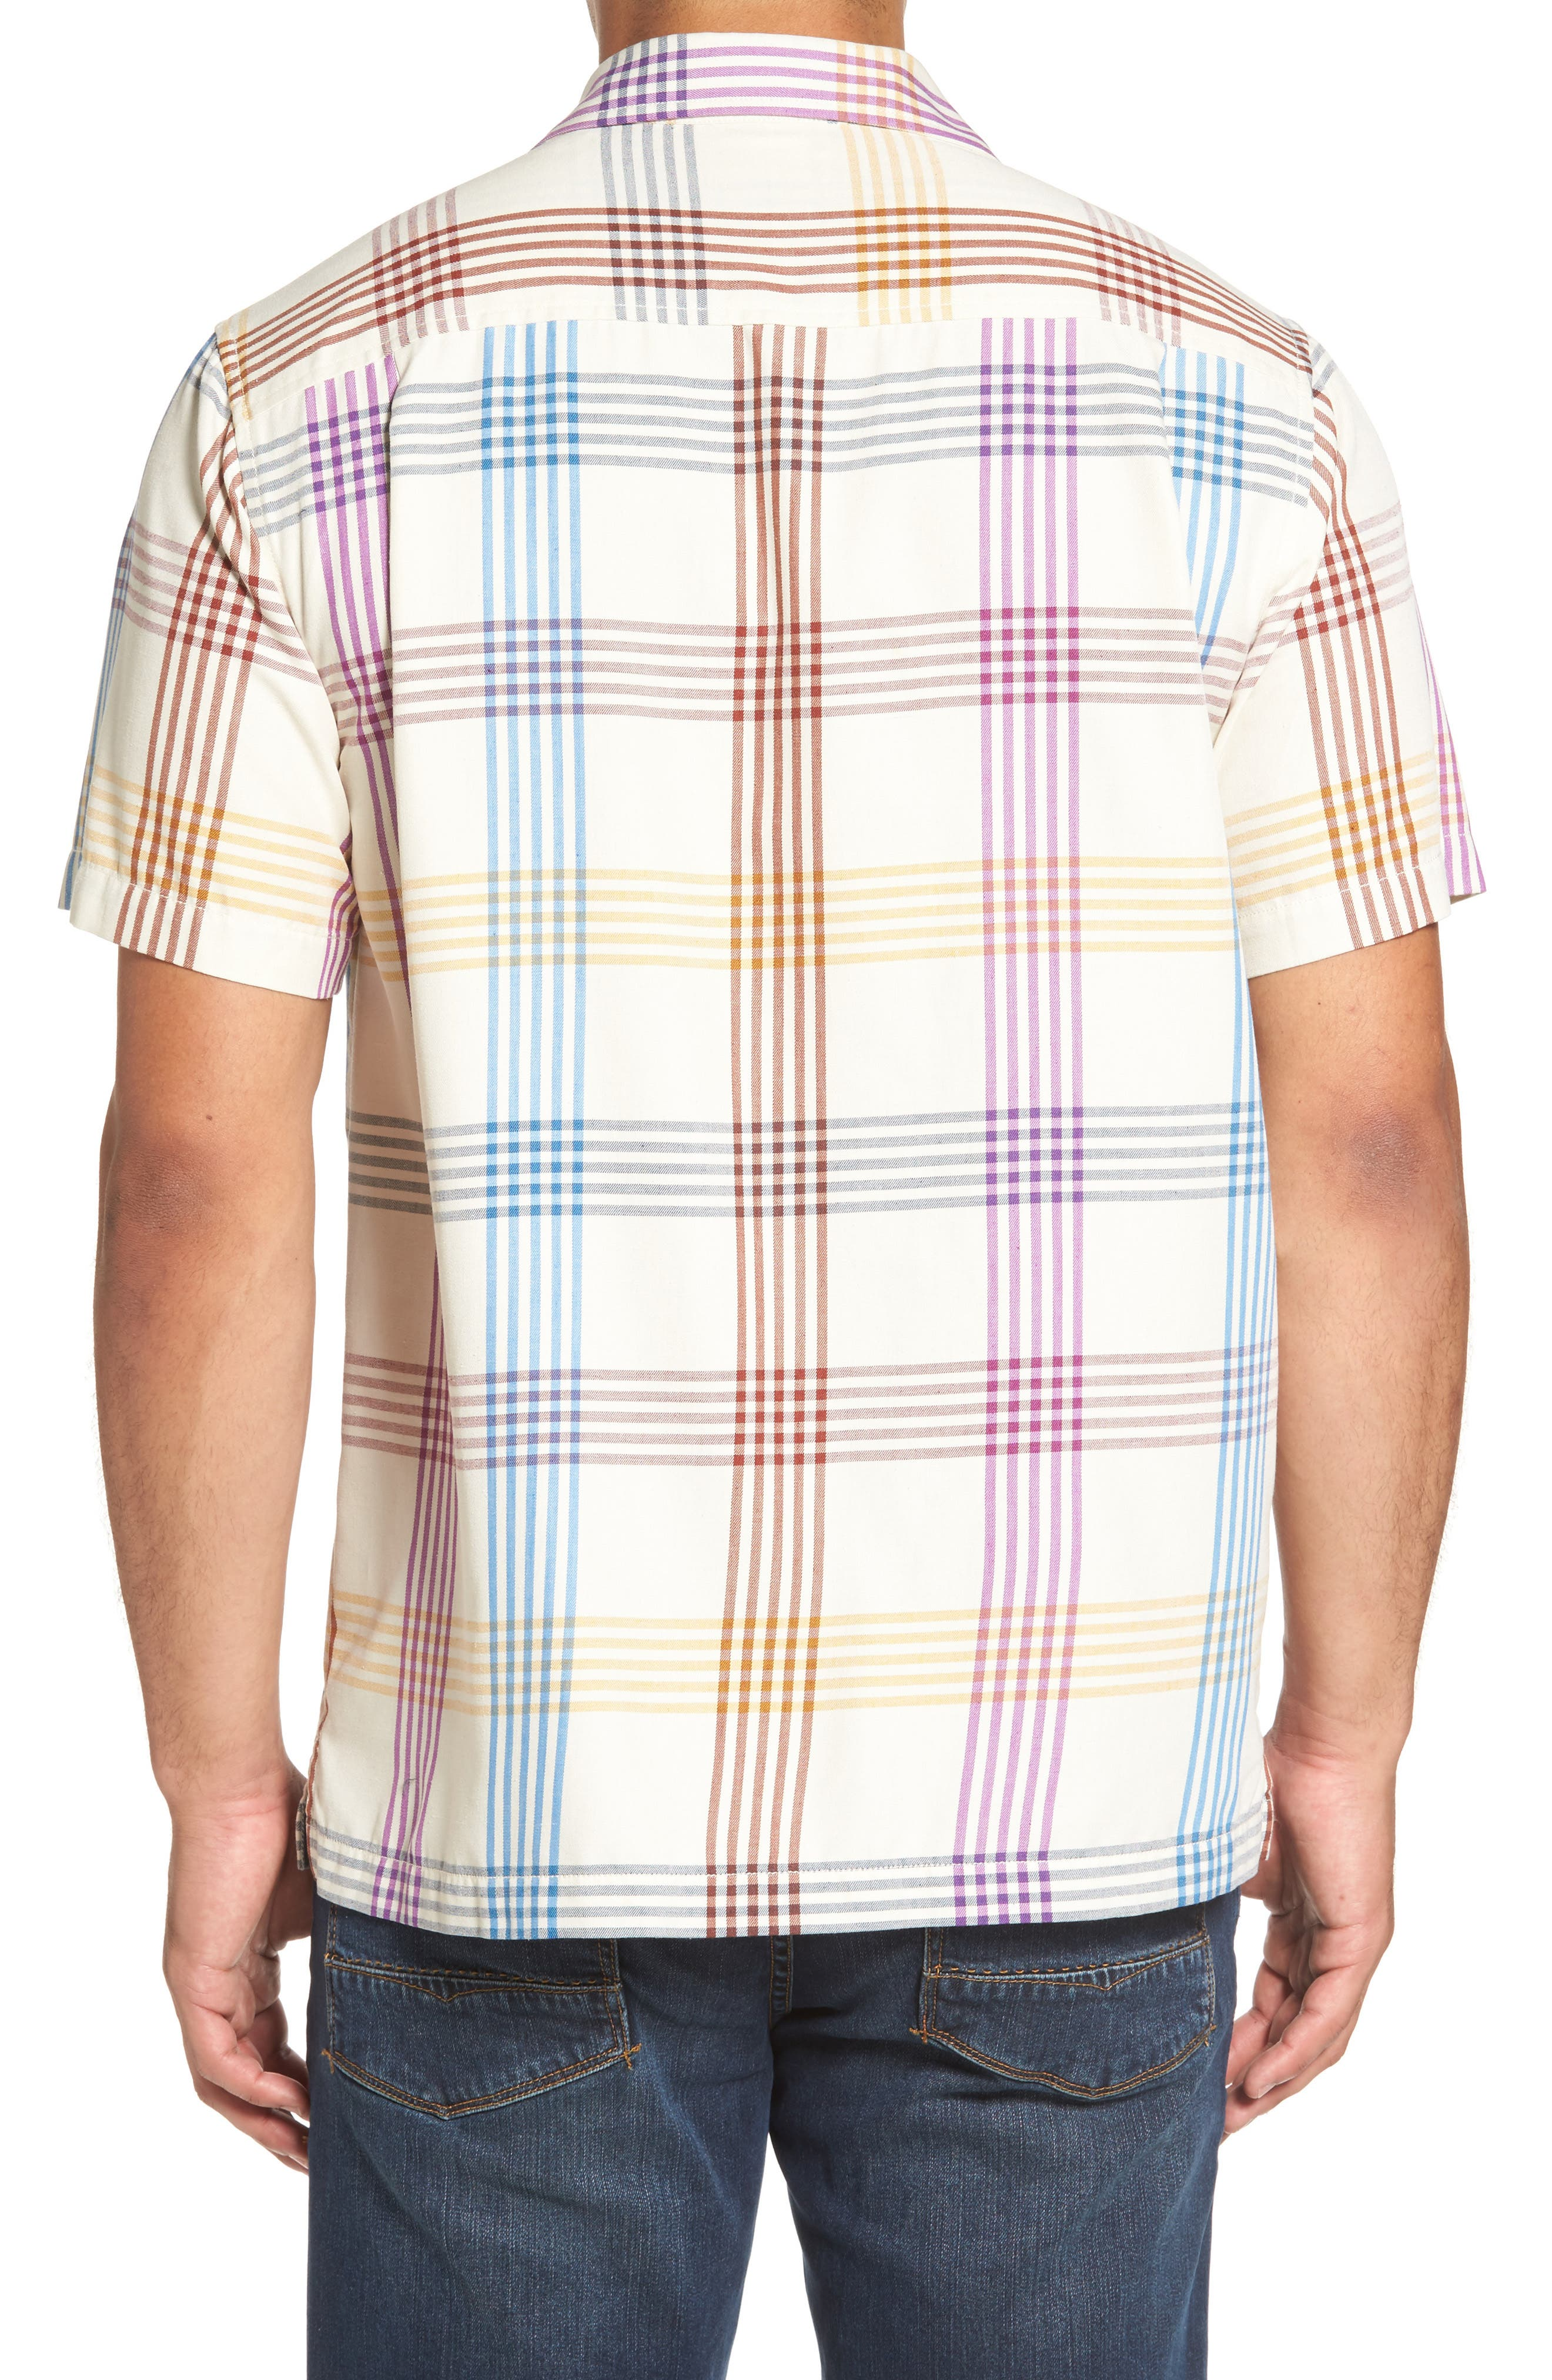 Alternate Image 2  - Tommy Bahama Mo' Rockin Standard Fit Silk Woven Shirt